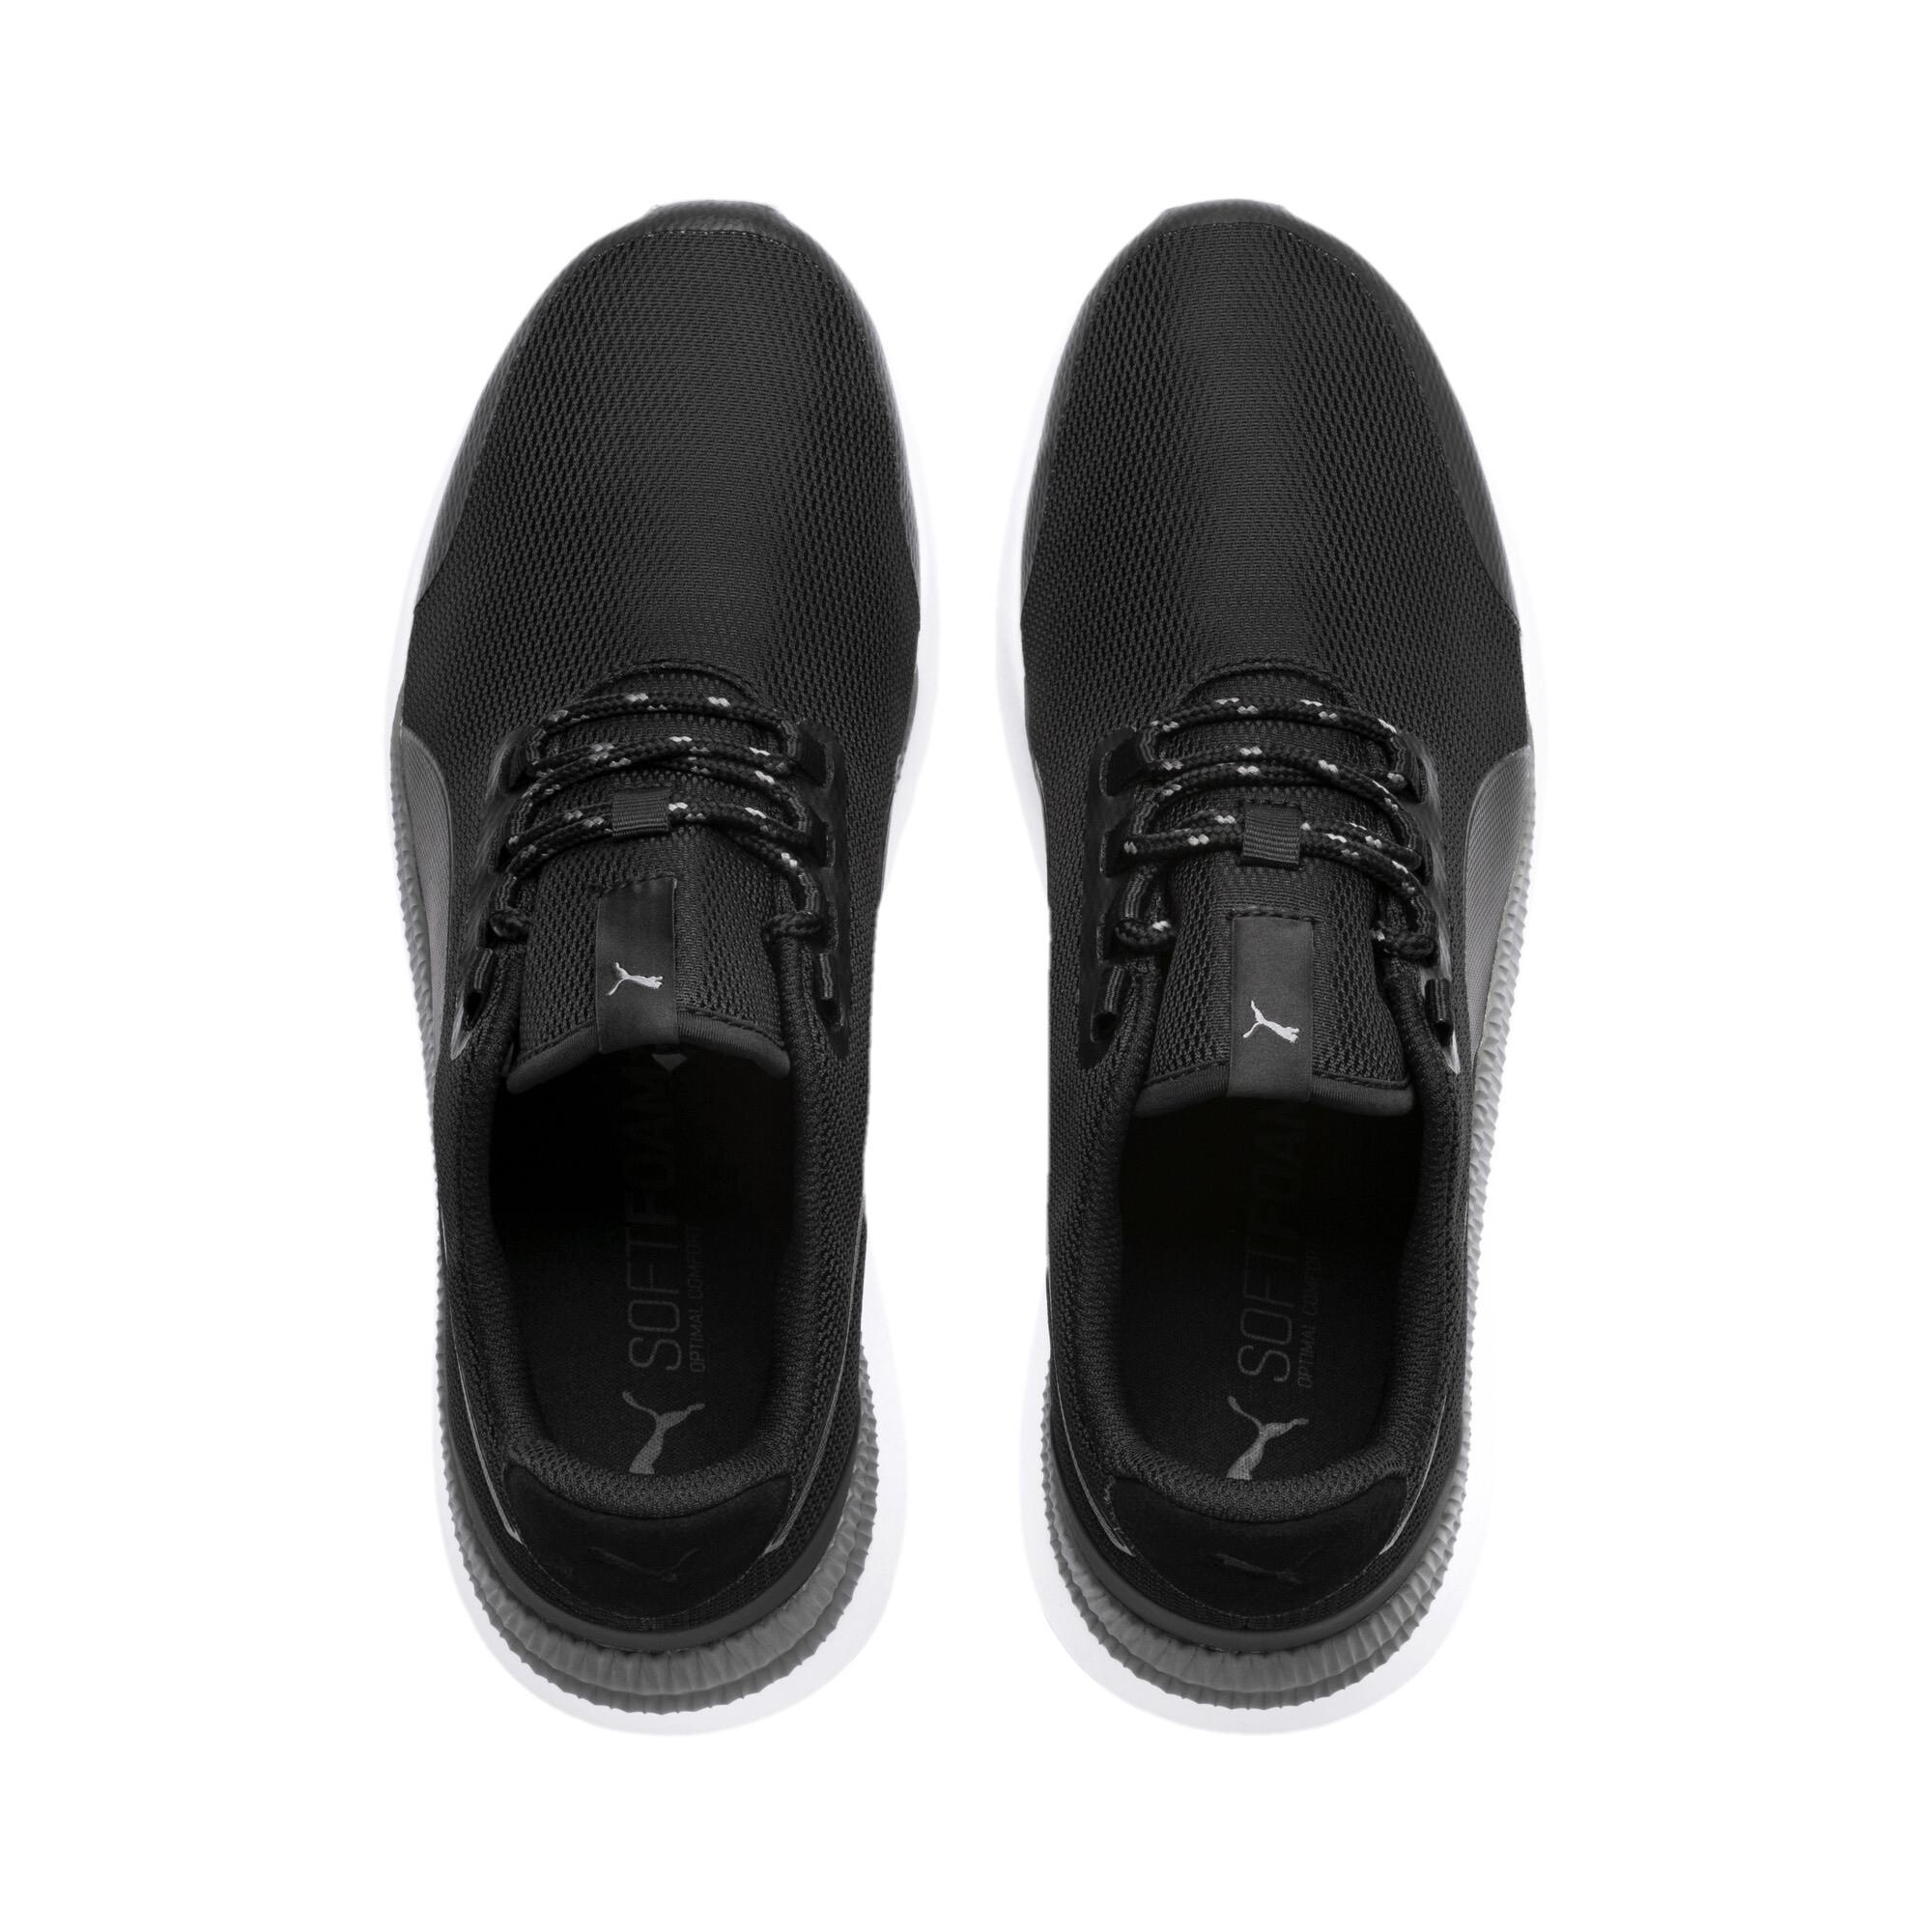 PUMA-Pacer-Next-FS-Men-039-s-Sneakers-Unisex-Shoe-Basics thumbnail 7